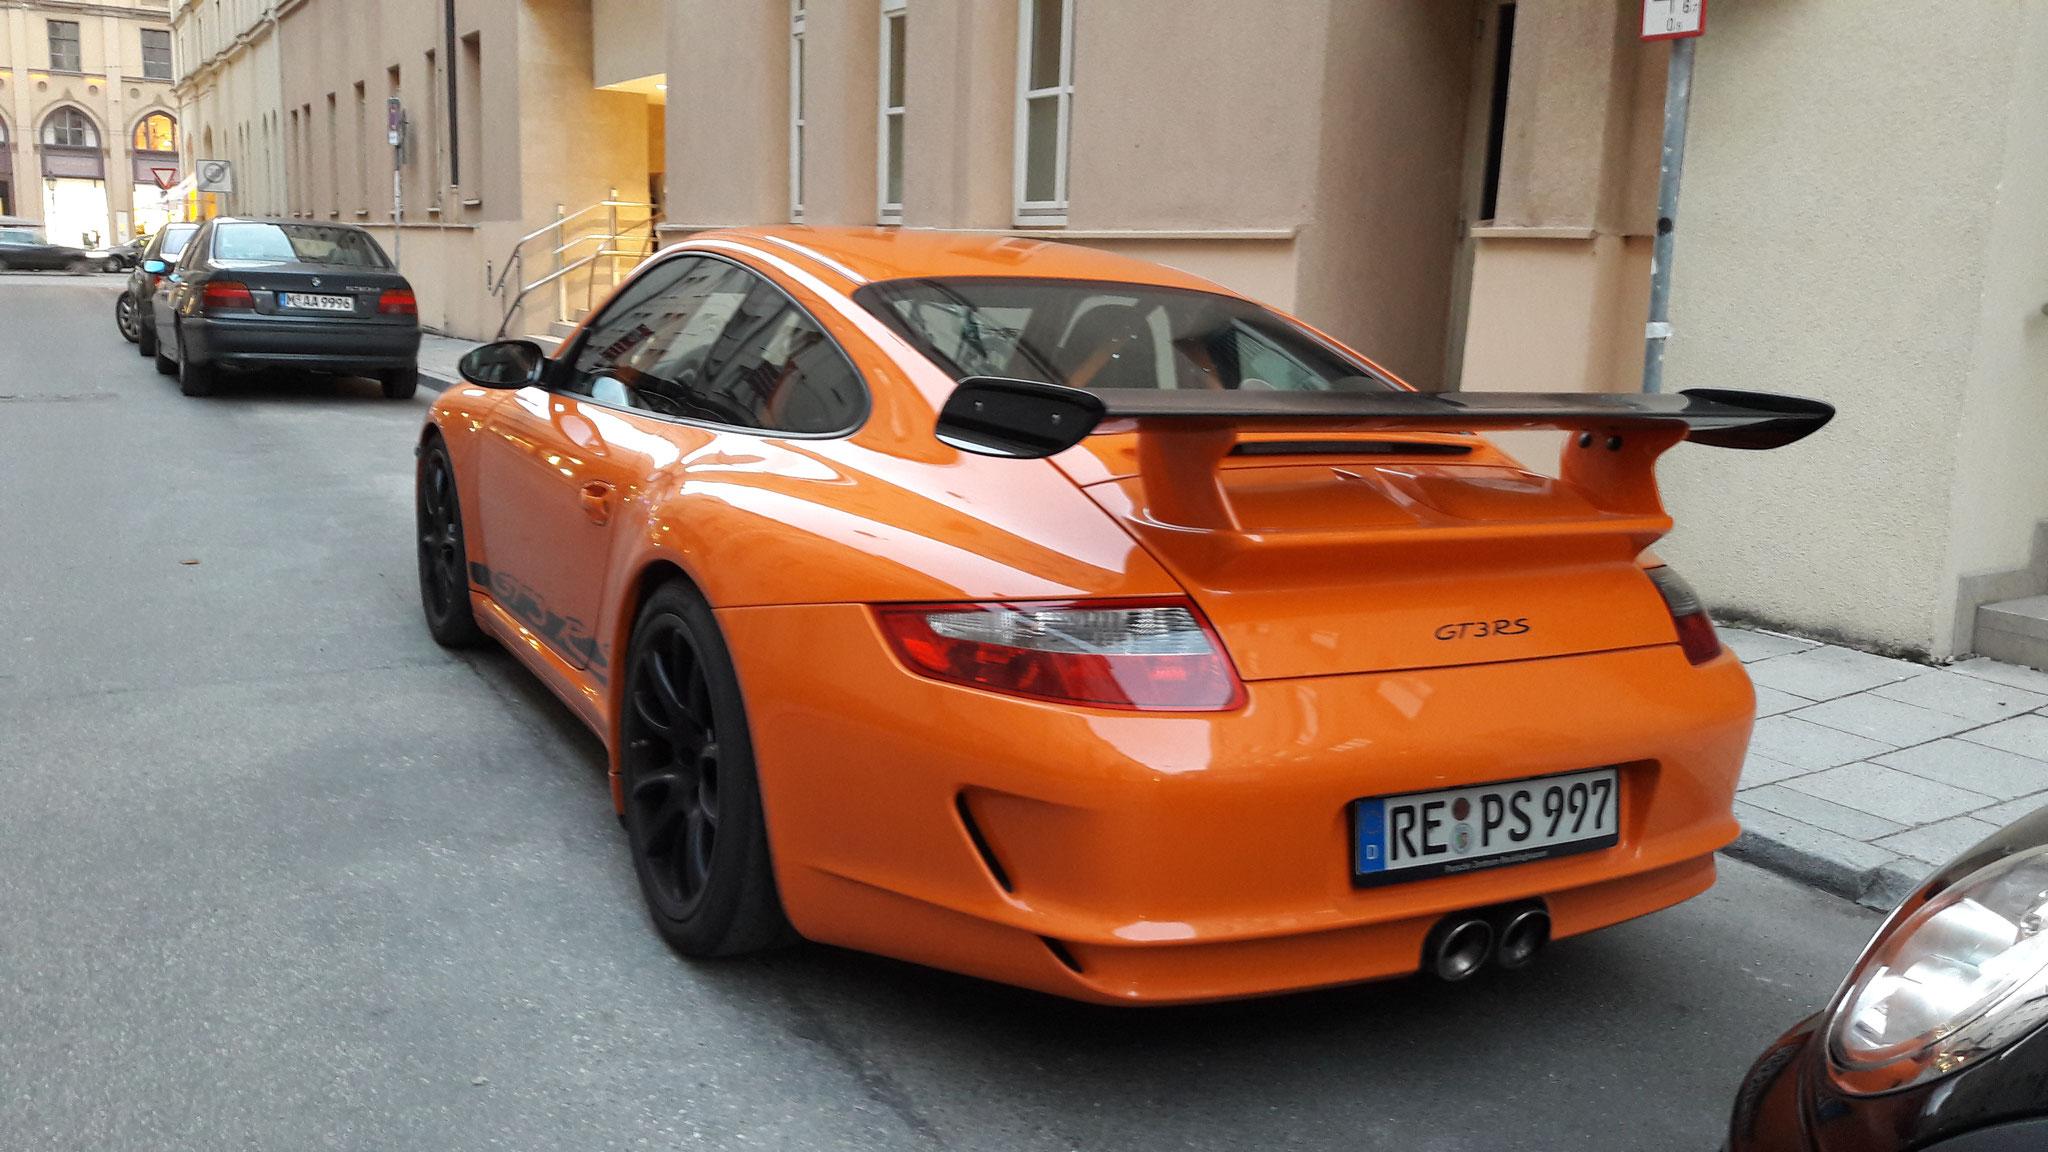 Porsche 911 GT3 RS - RE-PS-997